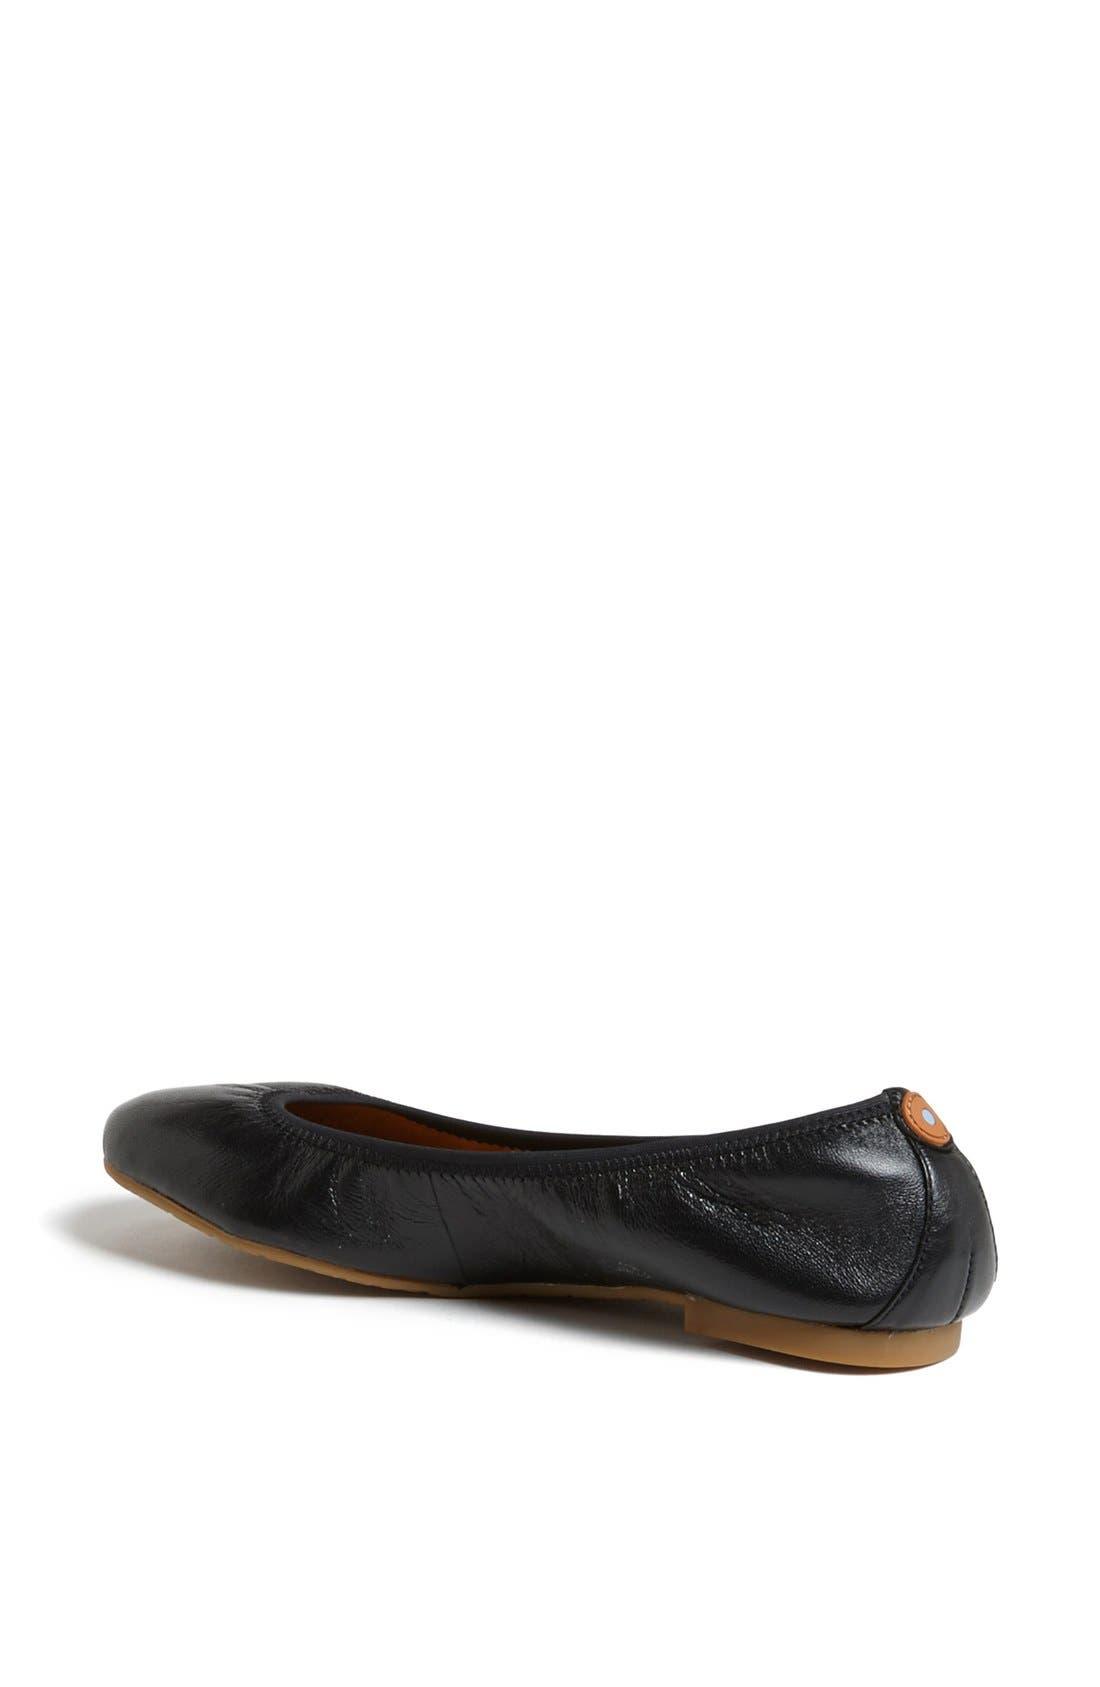 Alternate Image 2  - Juil 'The Flat' Earthing Leather Ballet Flat